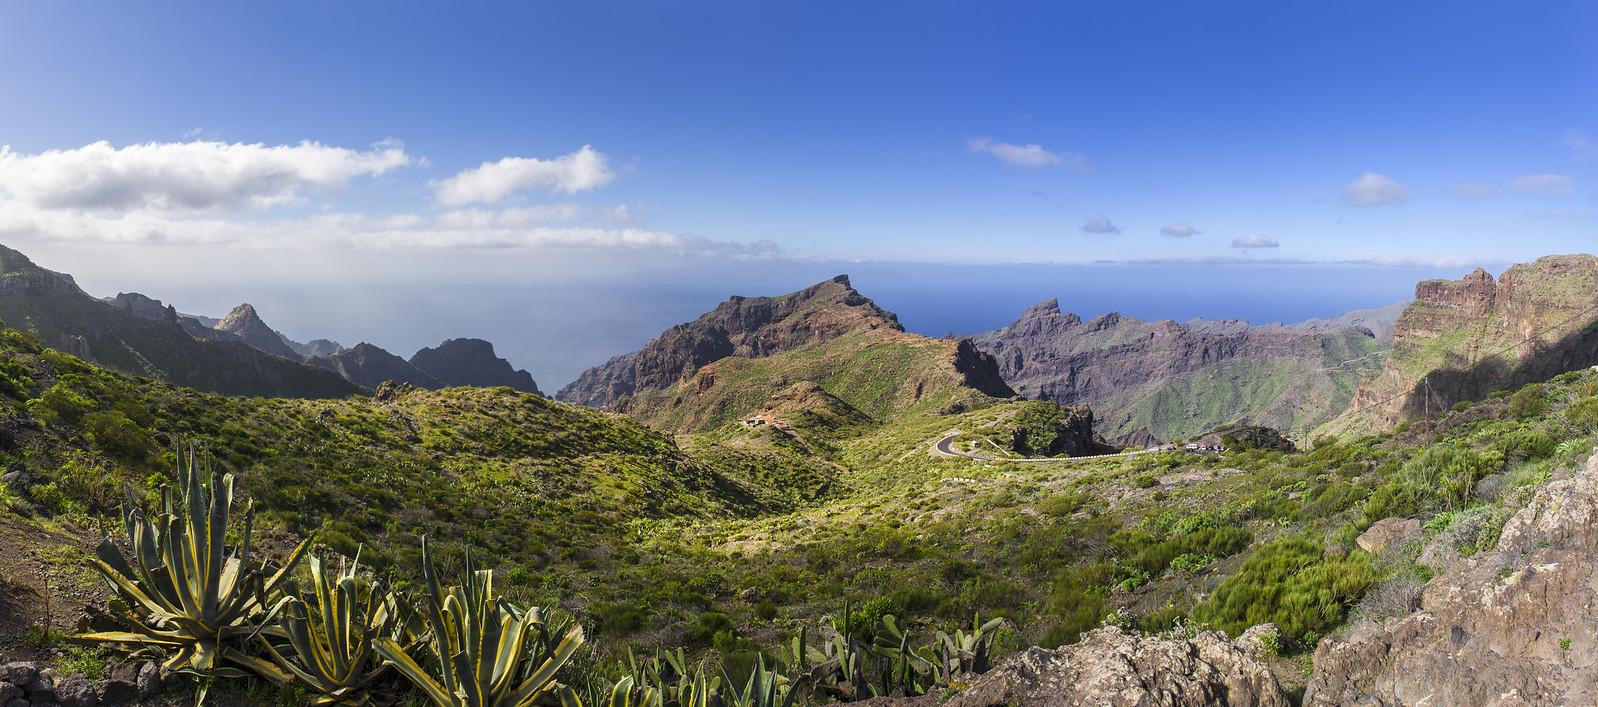 Panorama La Masca - Tenerife